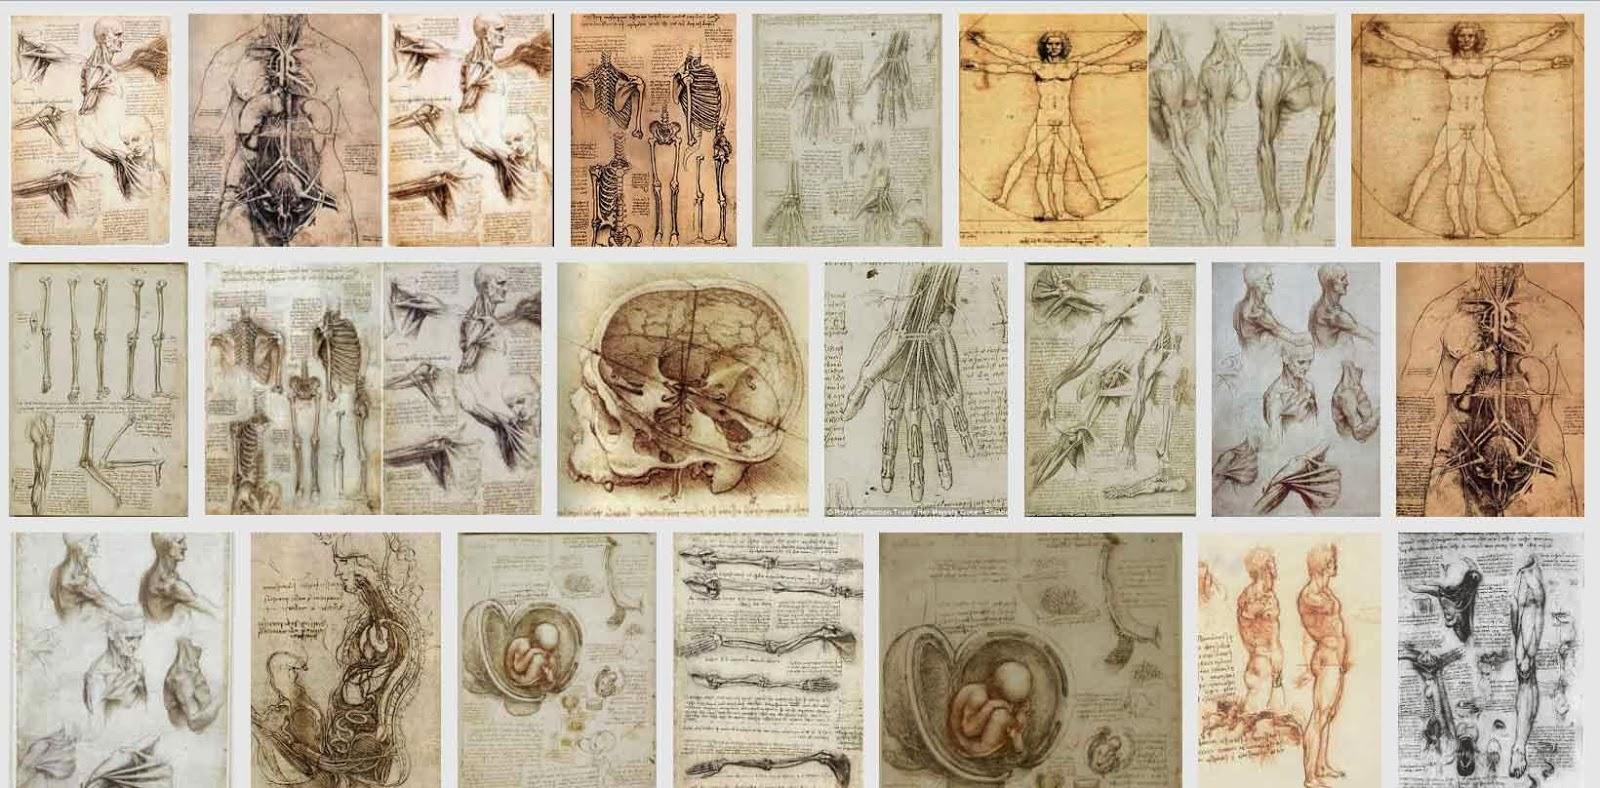 Leonardo da vinci anatomy drawings 9363897 - follow4more.info